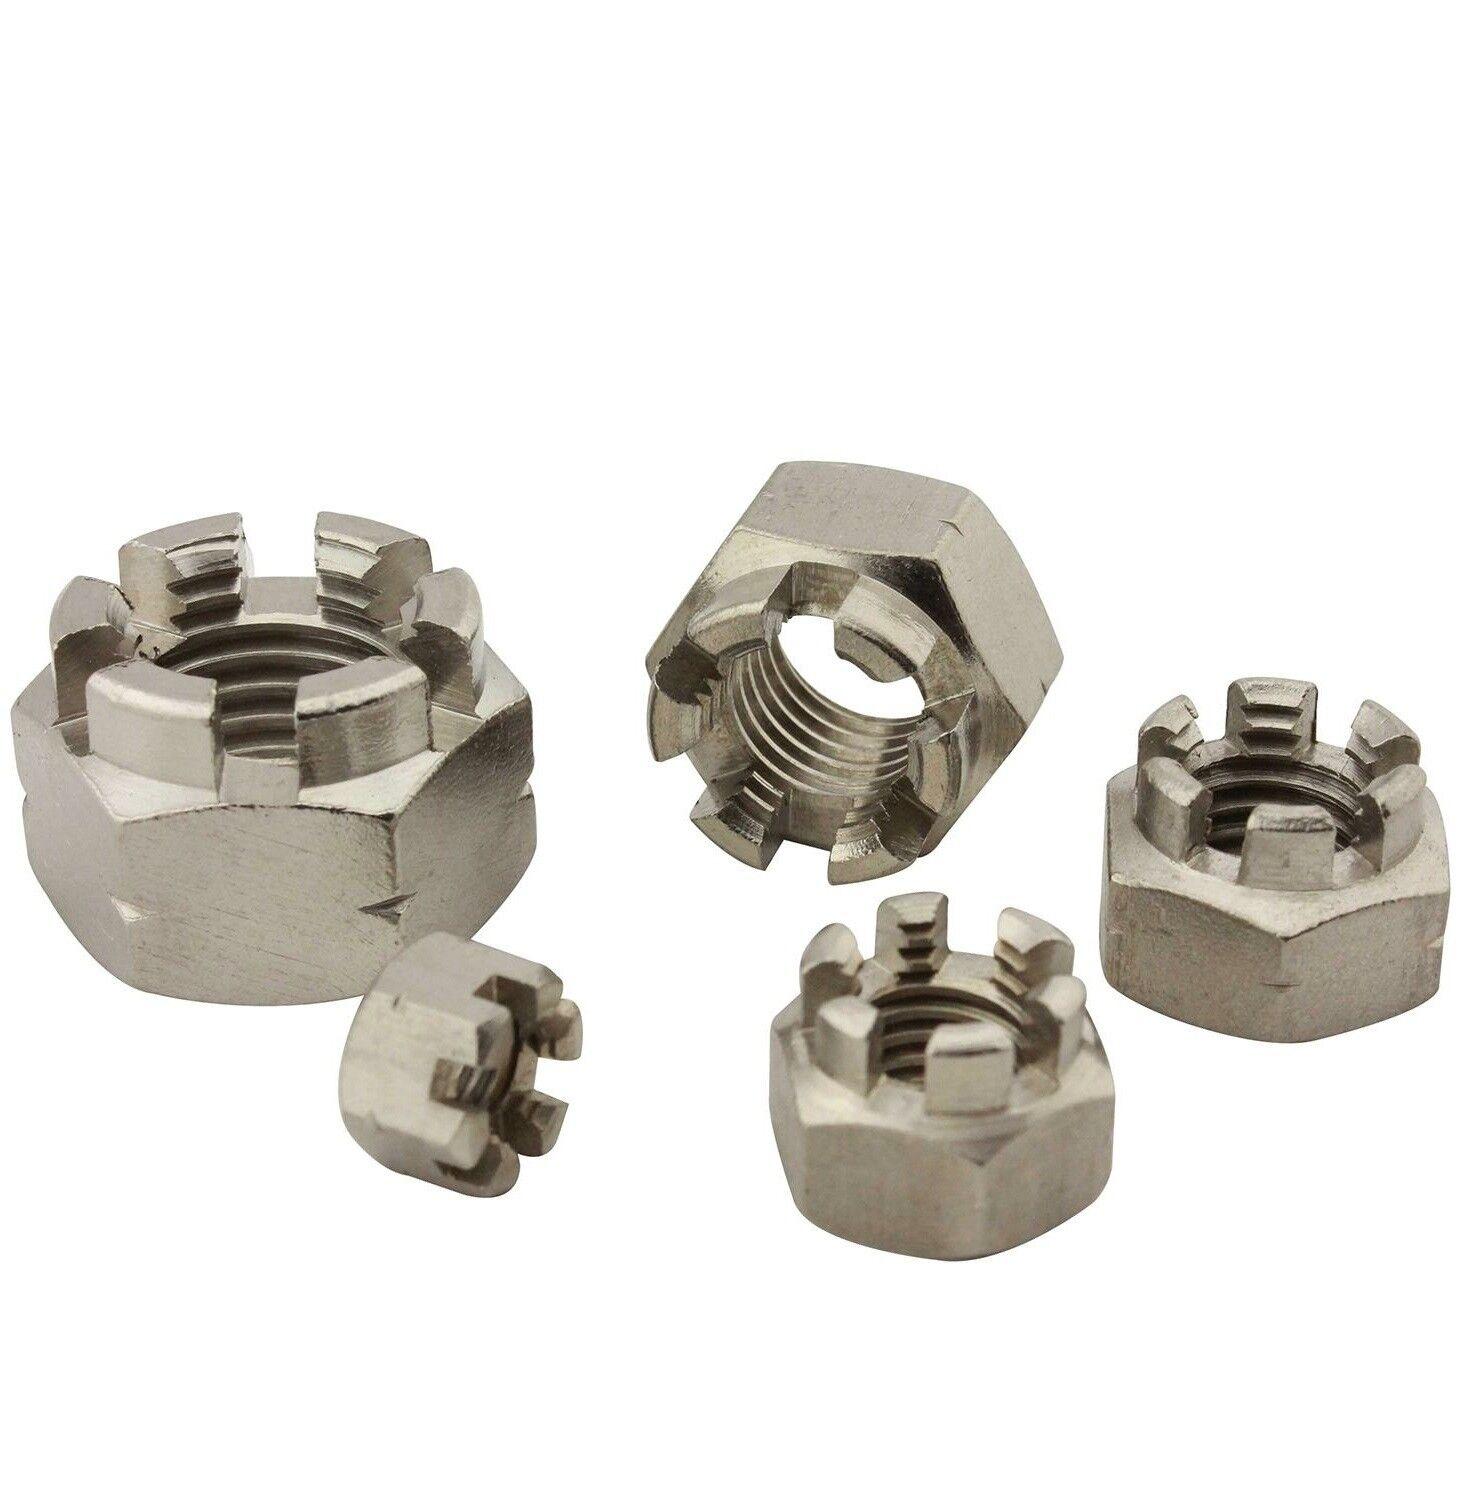 Kronenmutter Sicherungsmutter DIN 935   ISO 7036 Edelstahl A2 (V2A) Regelgewinde